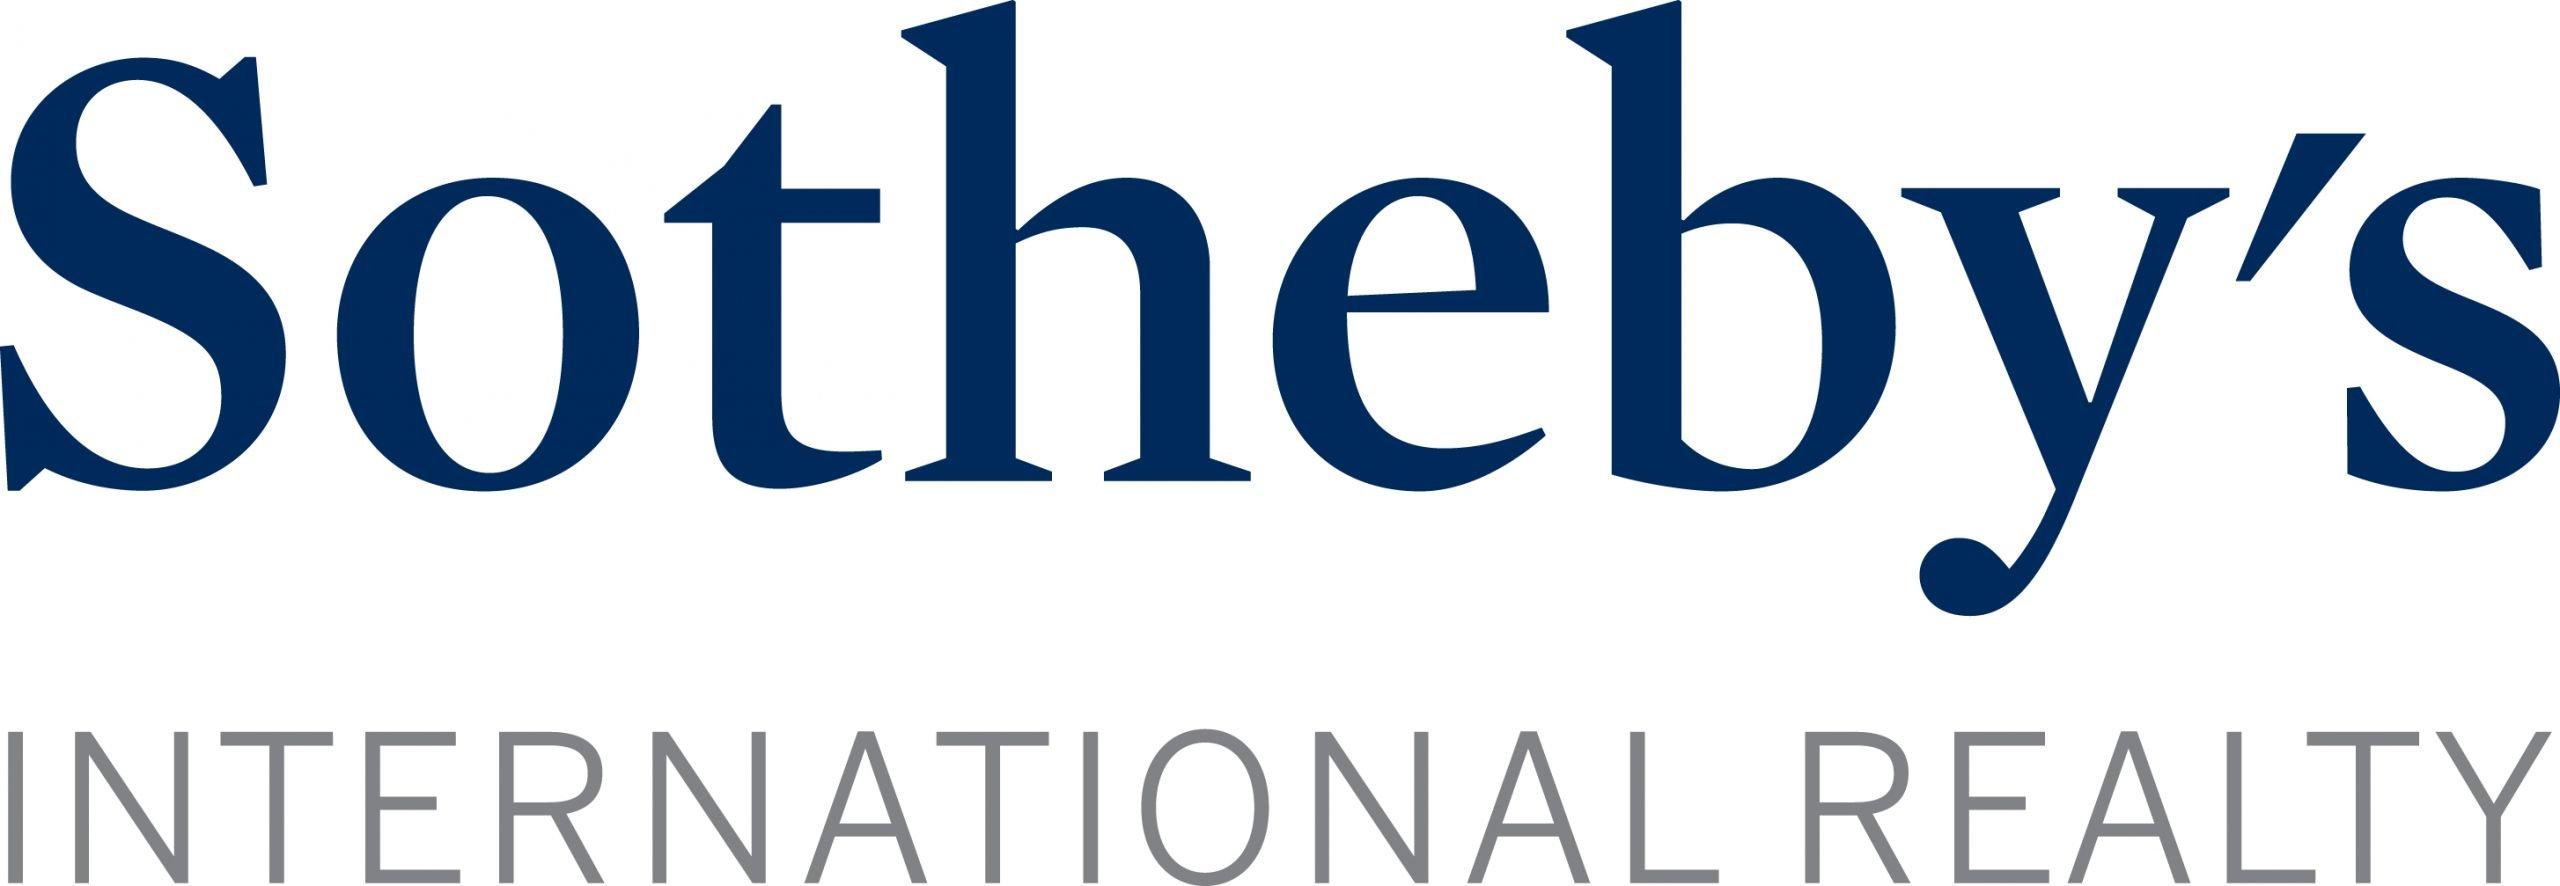 Sotheby's International Realty Inc., Sandwich Brokerage